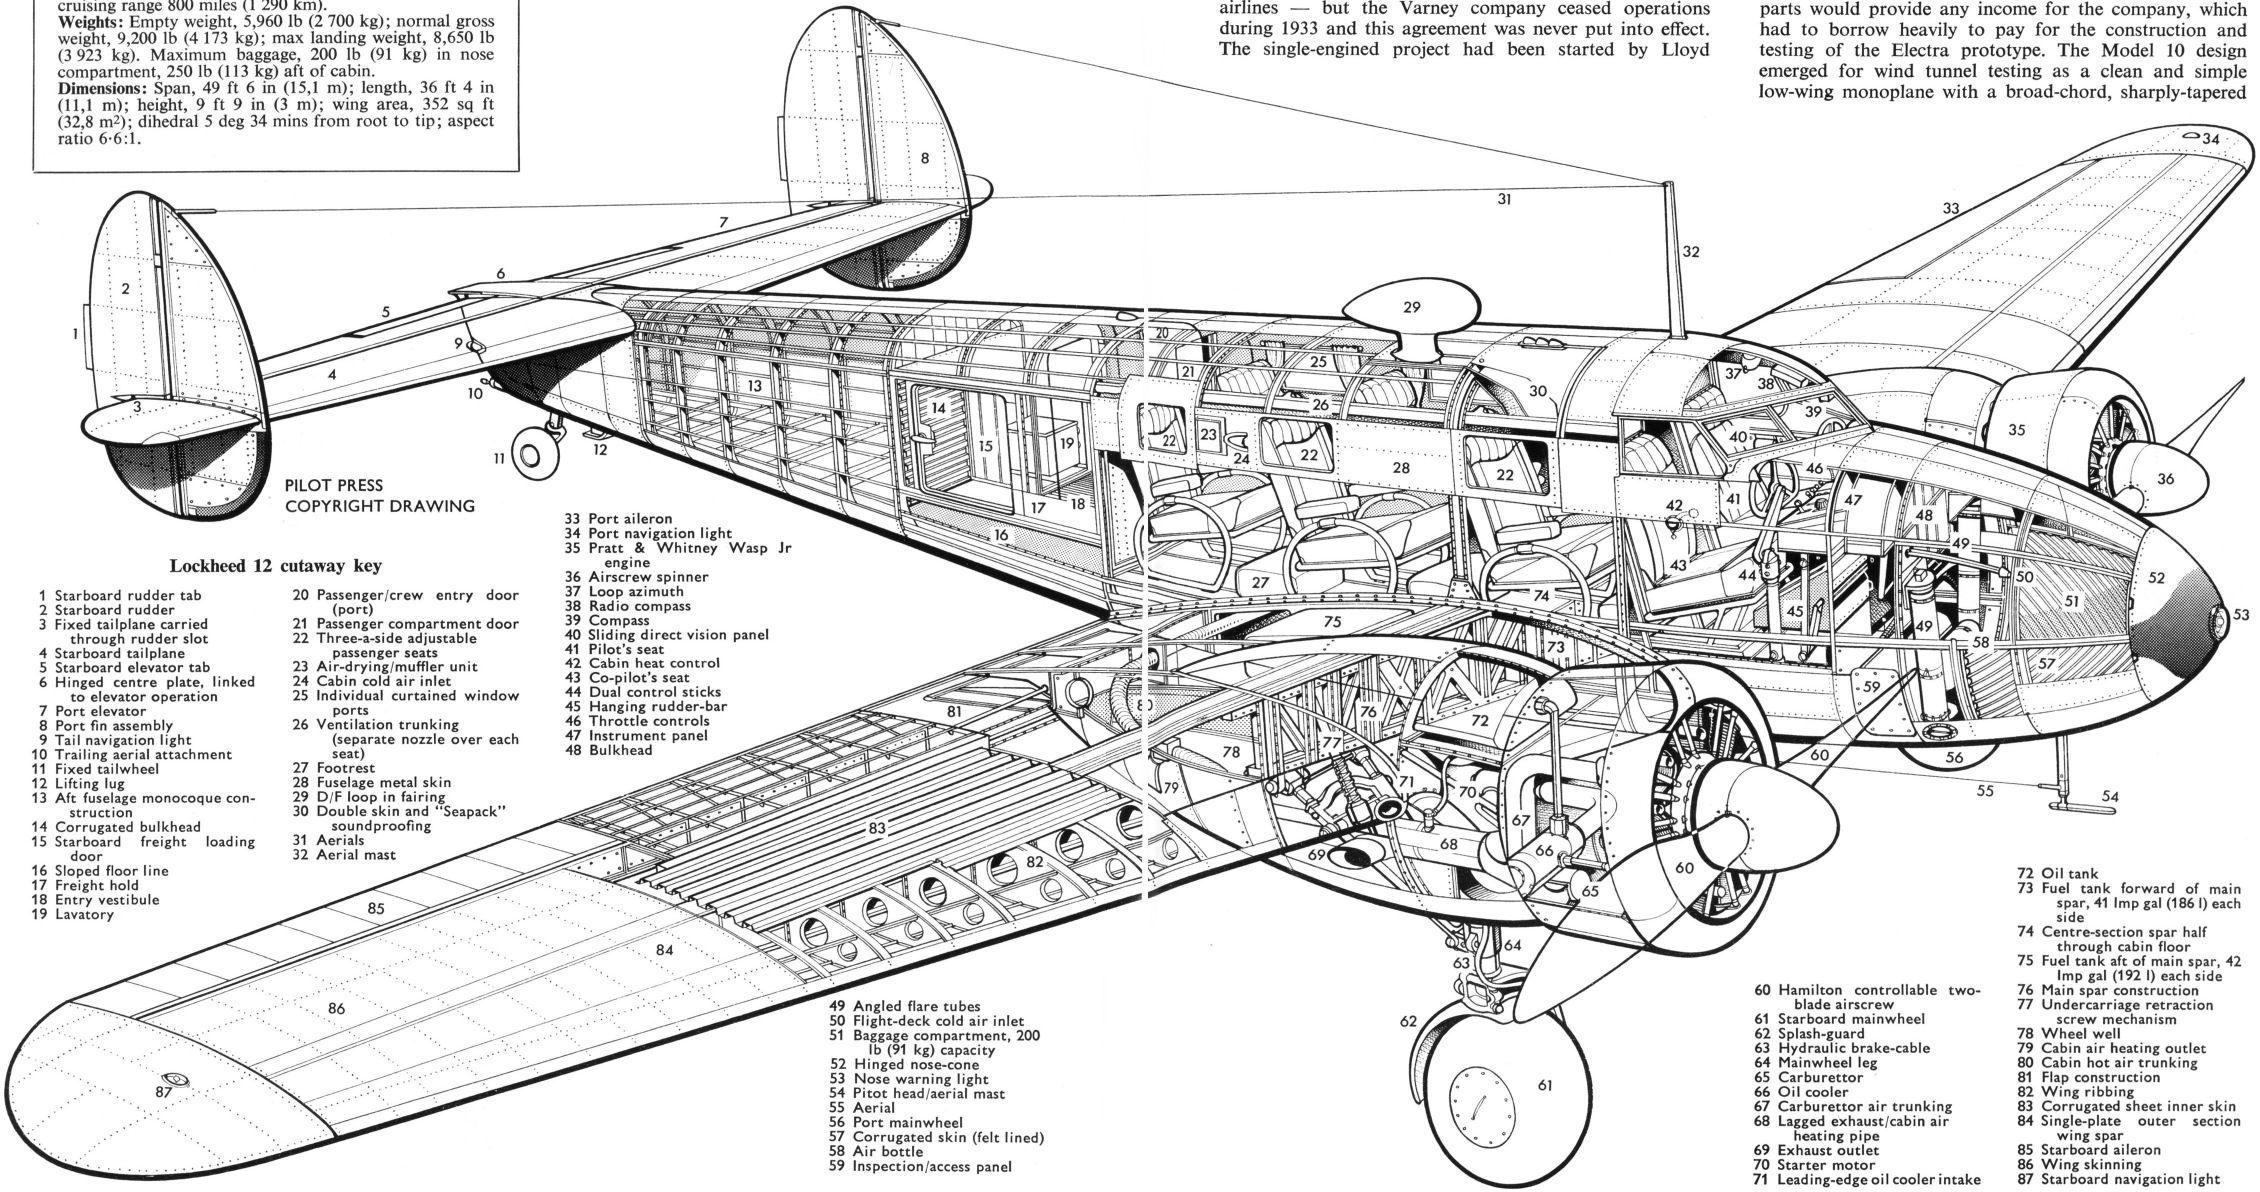 Lockheed Modelo 12 Electra Junior